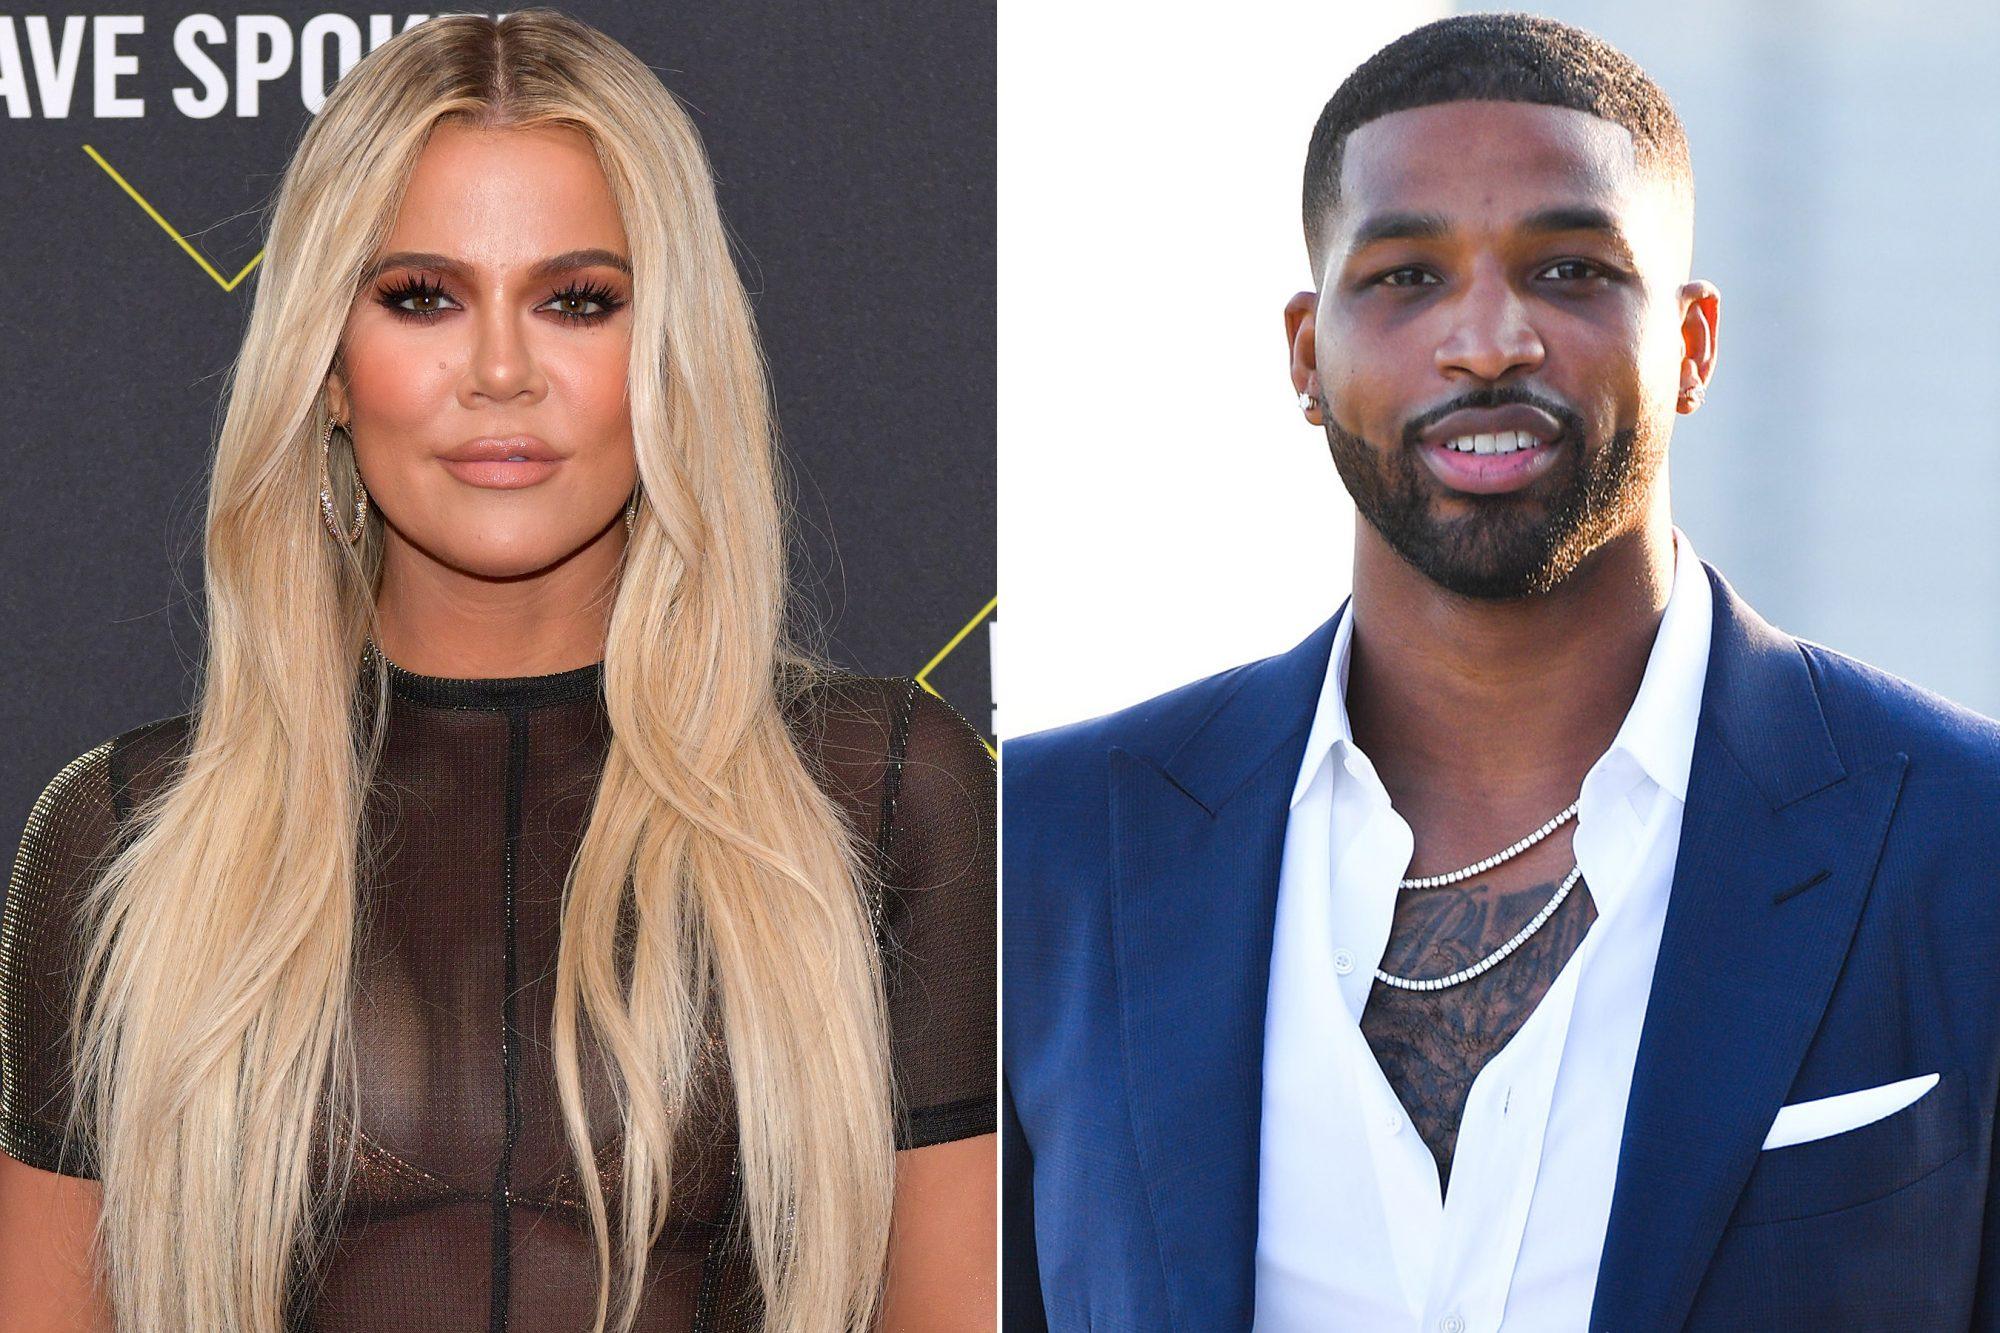 Reality TV star Khloe Kardashian and partner Tristan Thompson